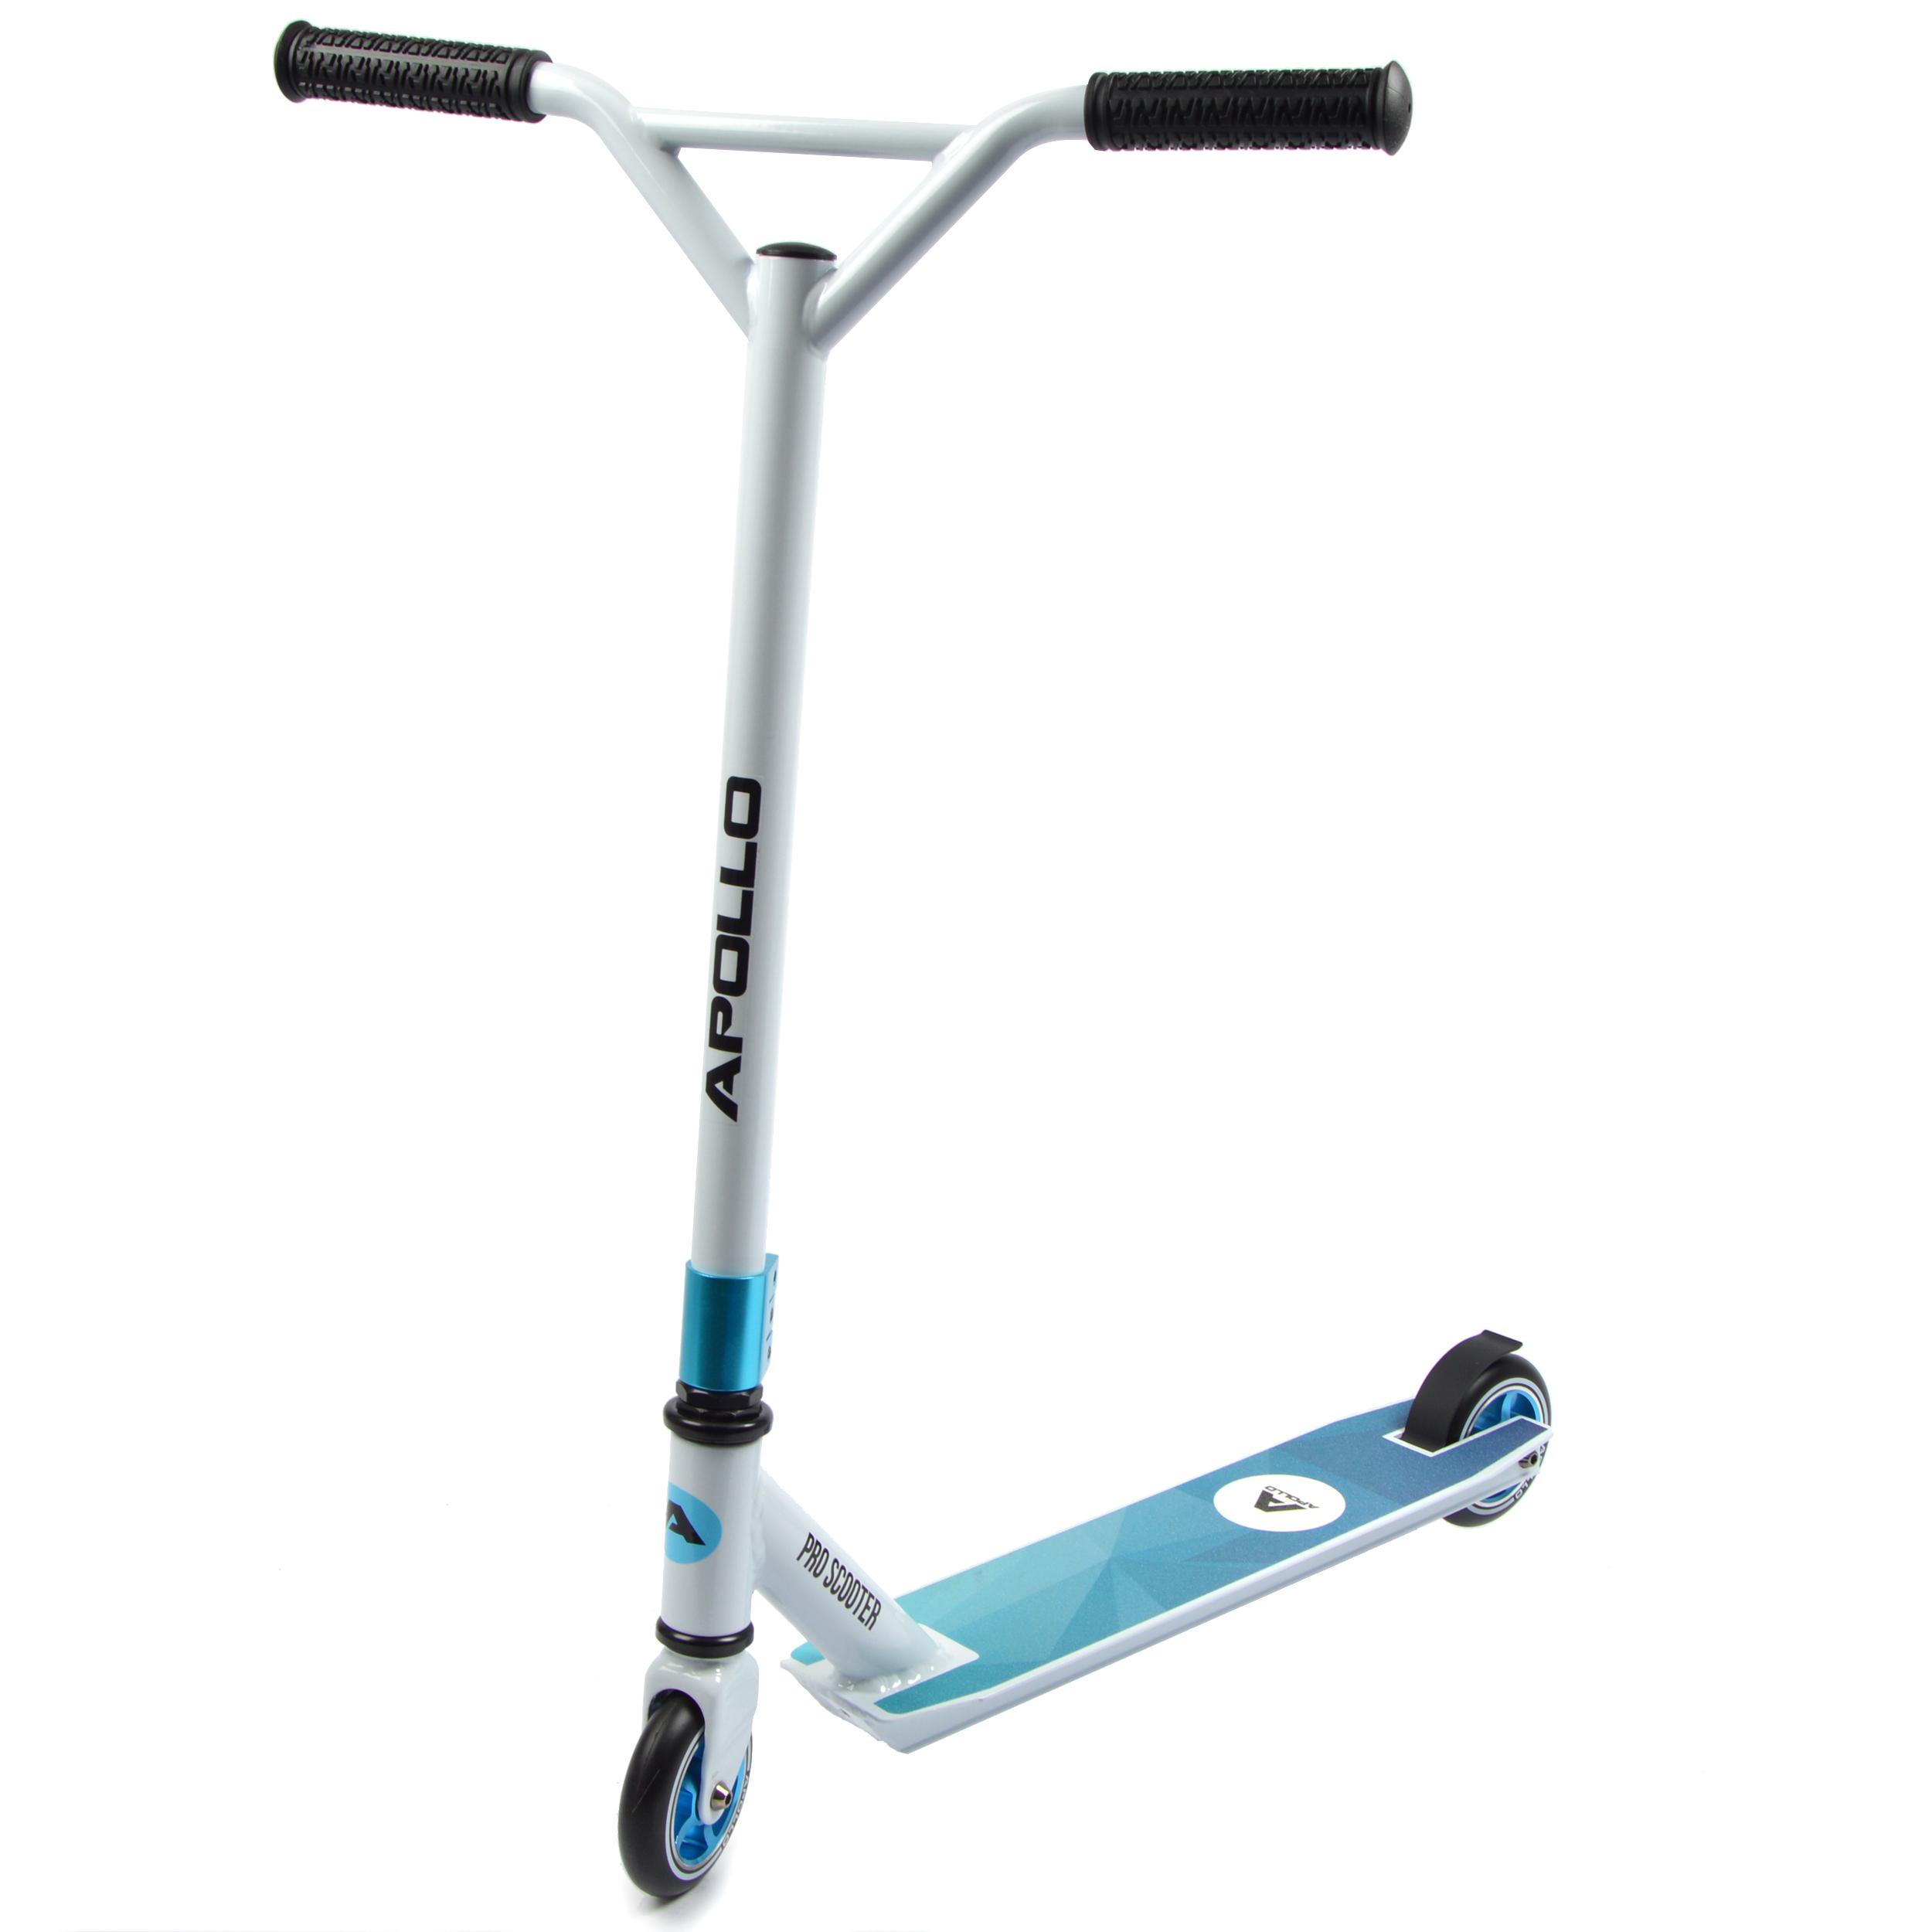 Apollo Stunt Scooter - Genius Pro - White/Blue